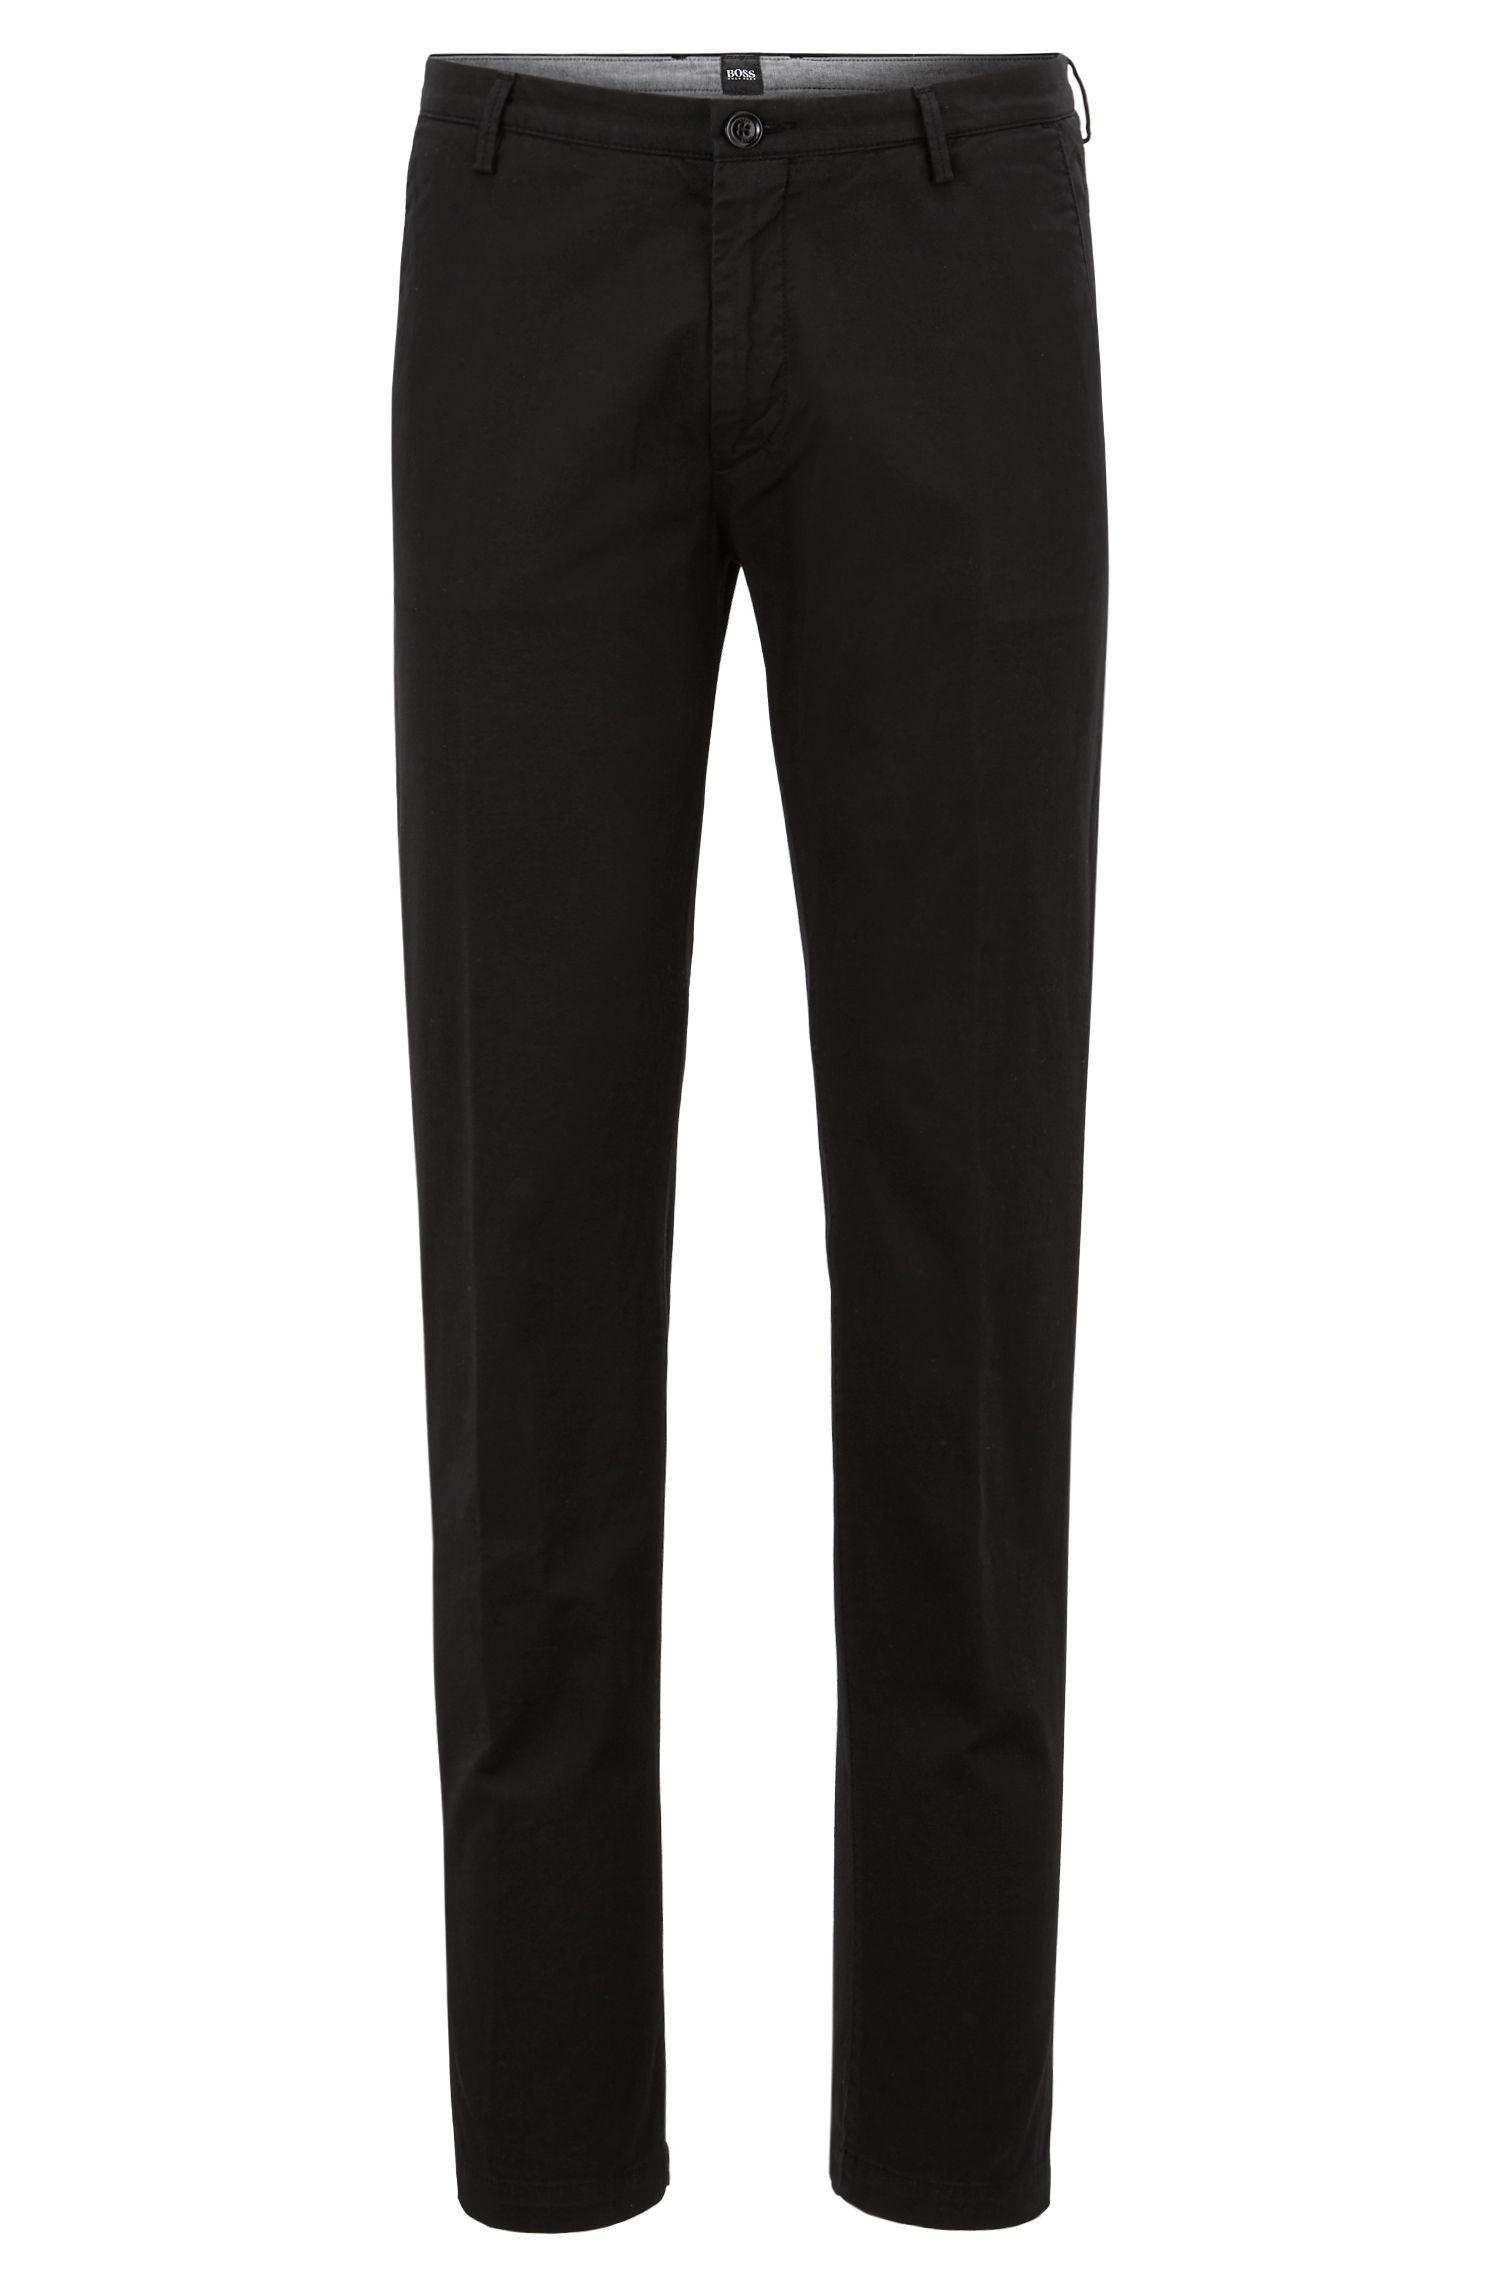 Slim-fit chinos in stretch cotton gabardine by BOSS Menswear